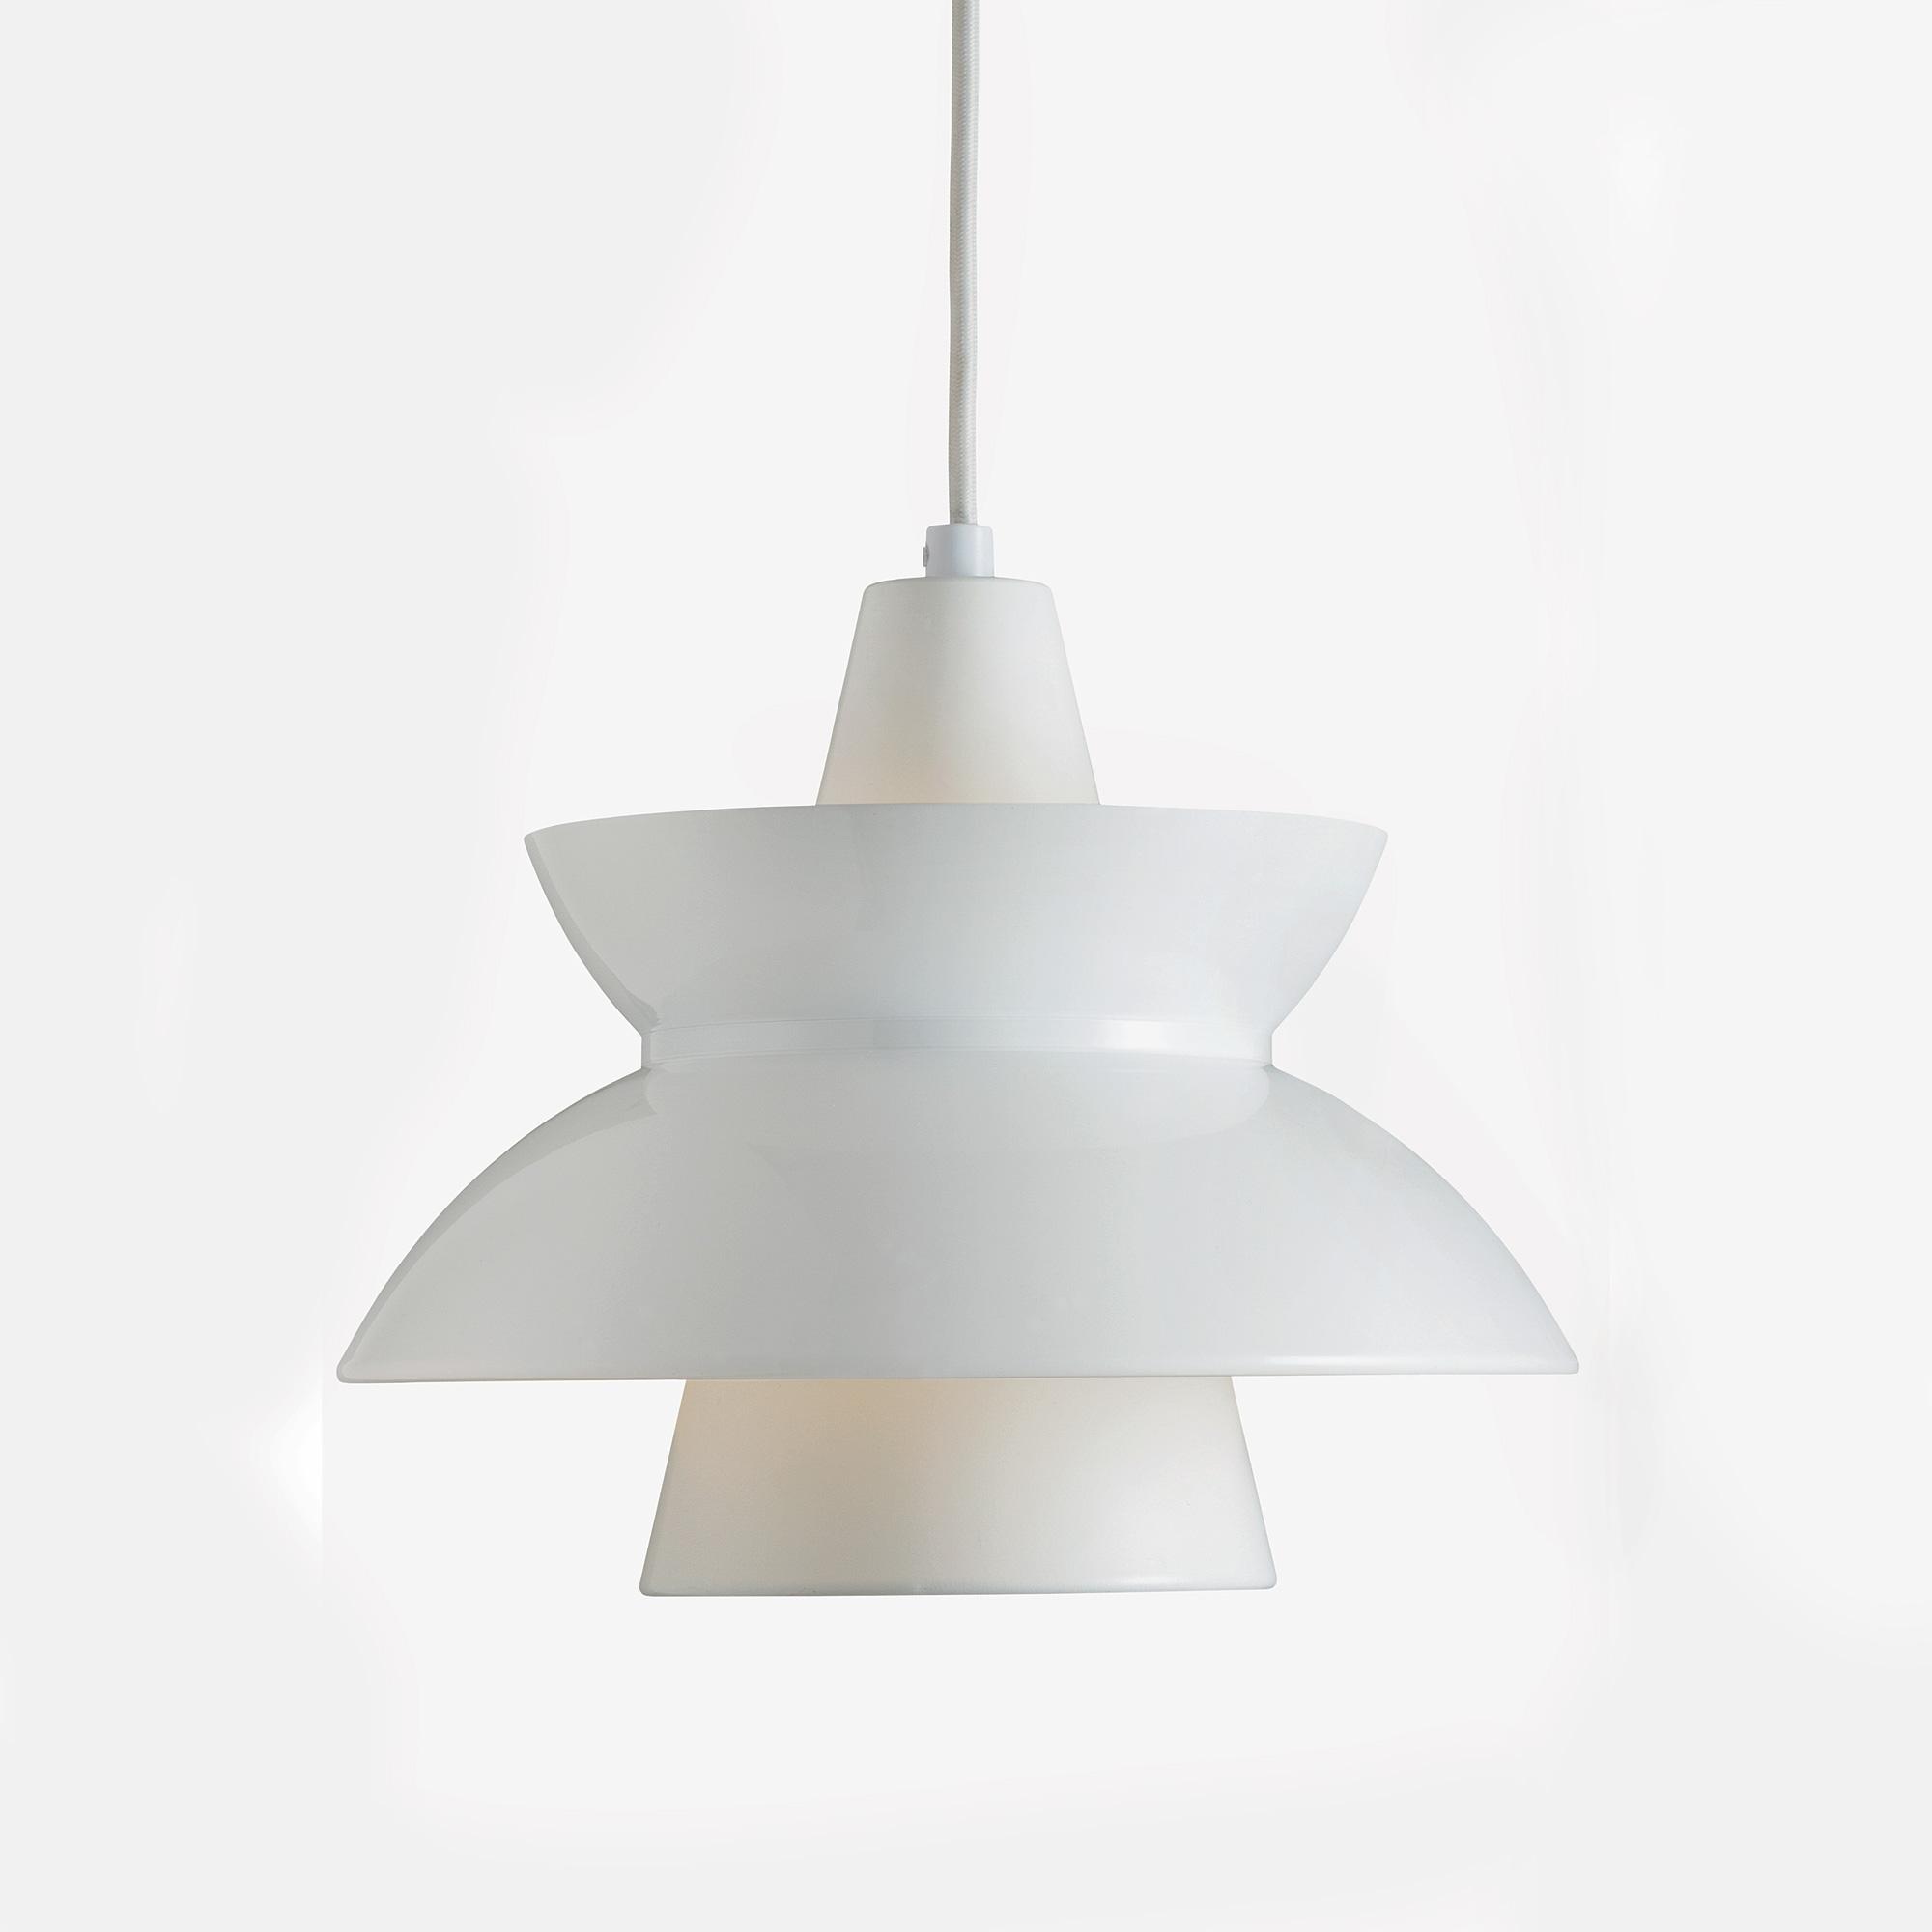 louis poulsen doo wop pendelleuchte 5741093410 reuter onlineshop. Black Bedroom Furniture Sets. Home Design Ideas